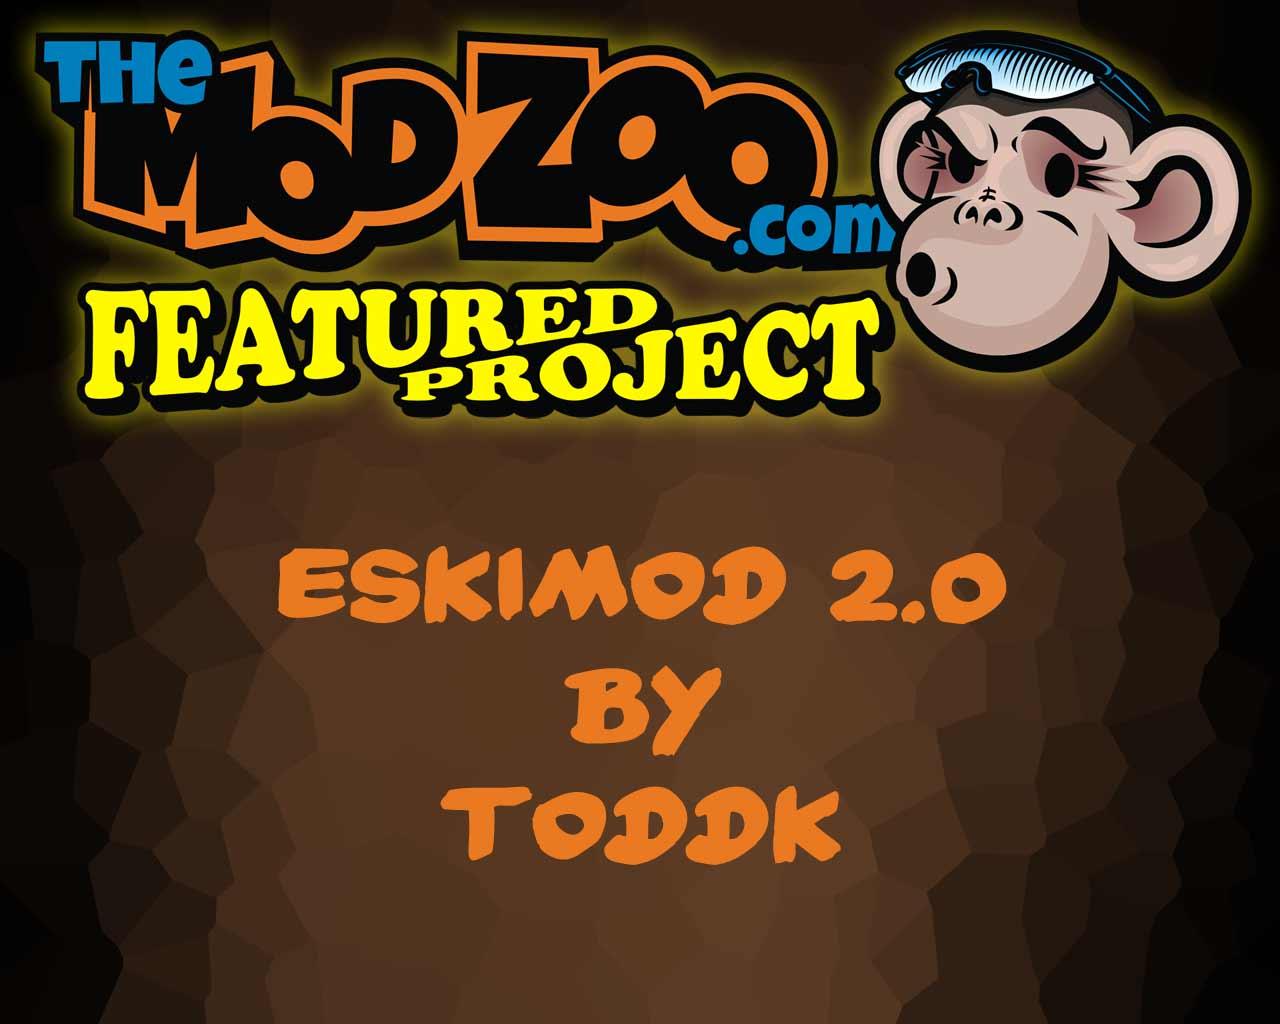 featured-project-eskimod-2.0-toddk